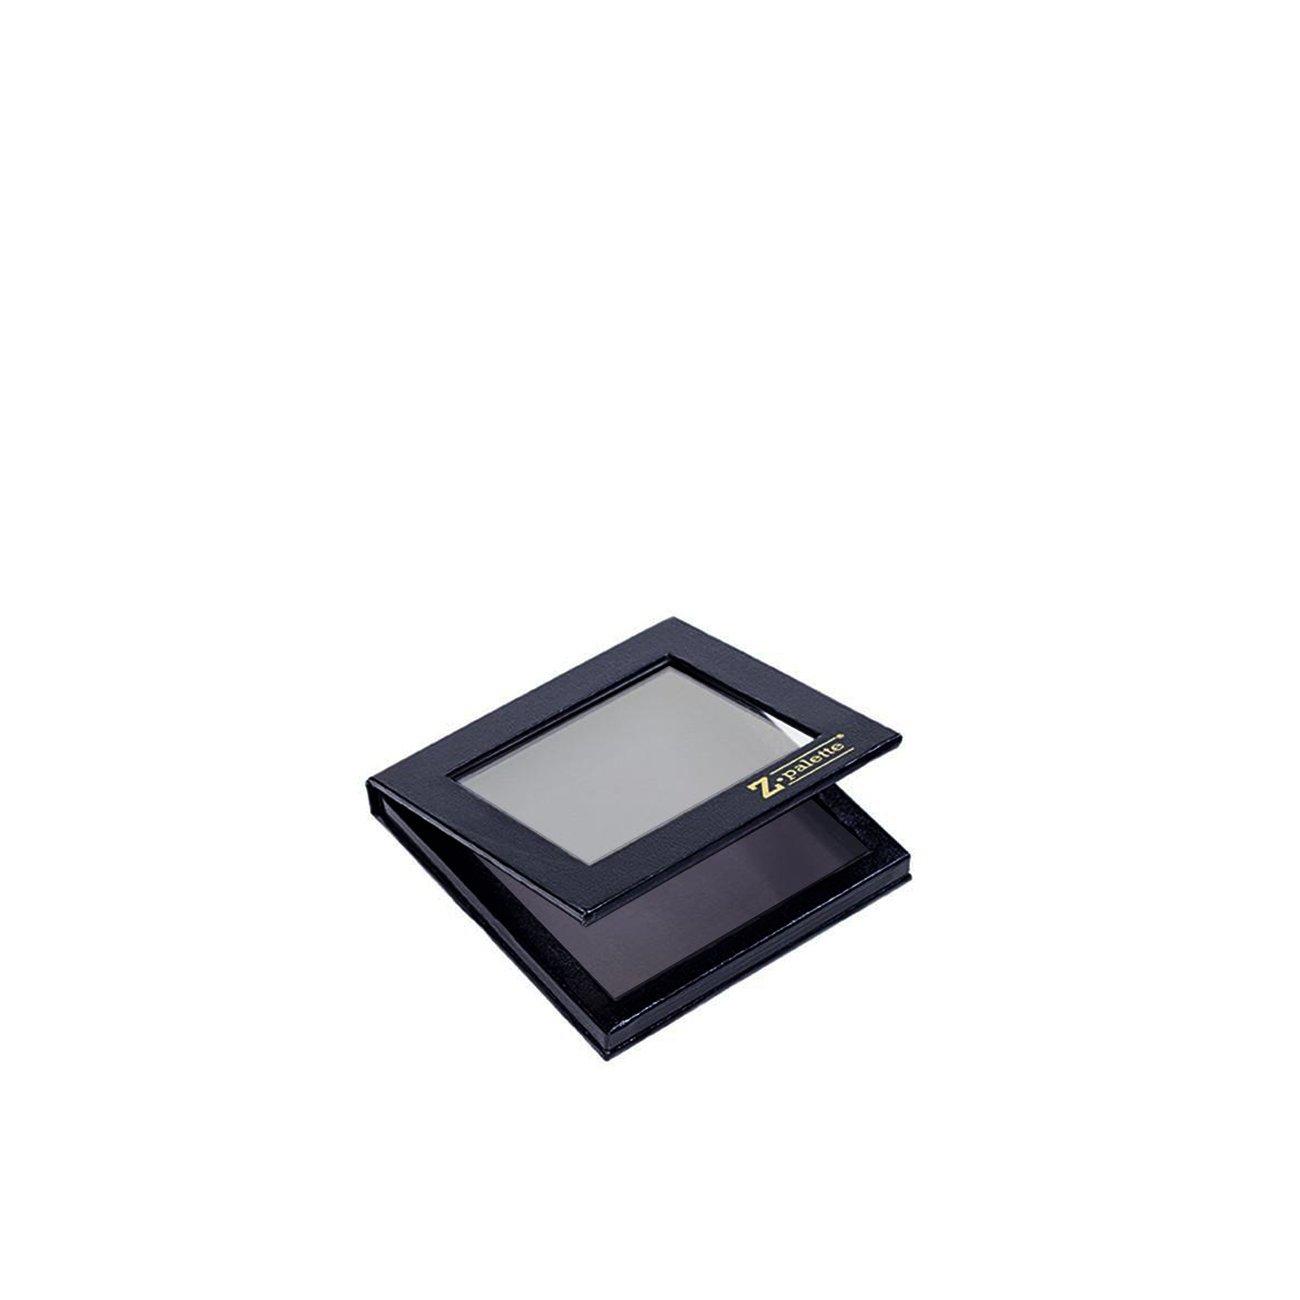 Z Palette - Black, Small